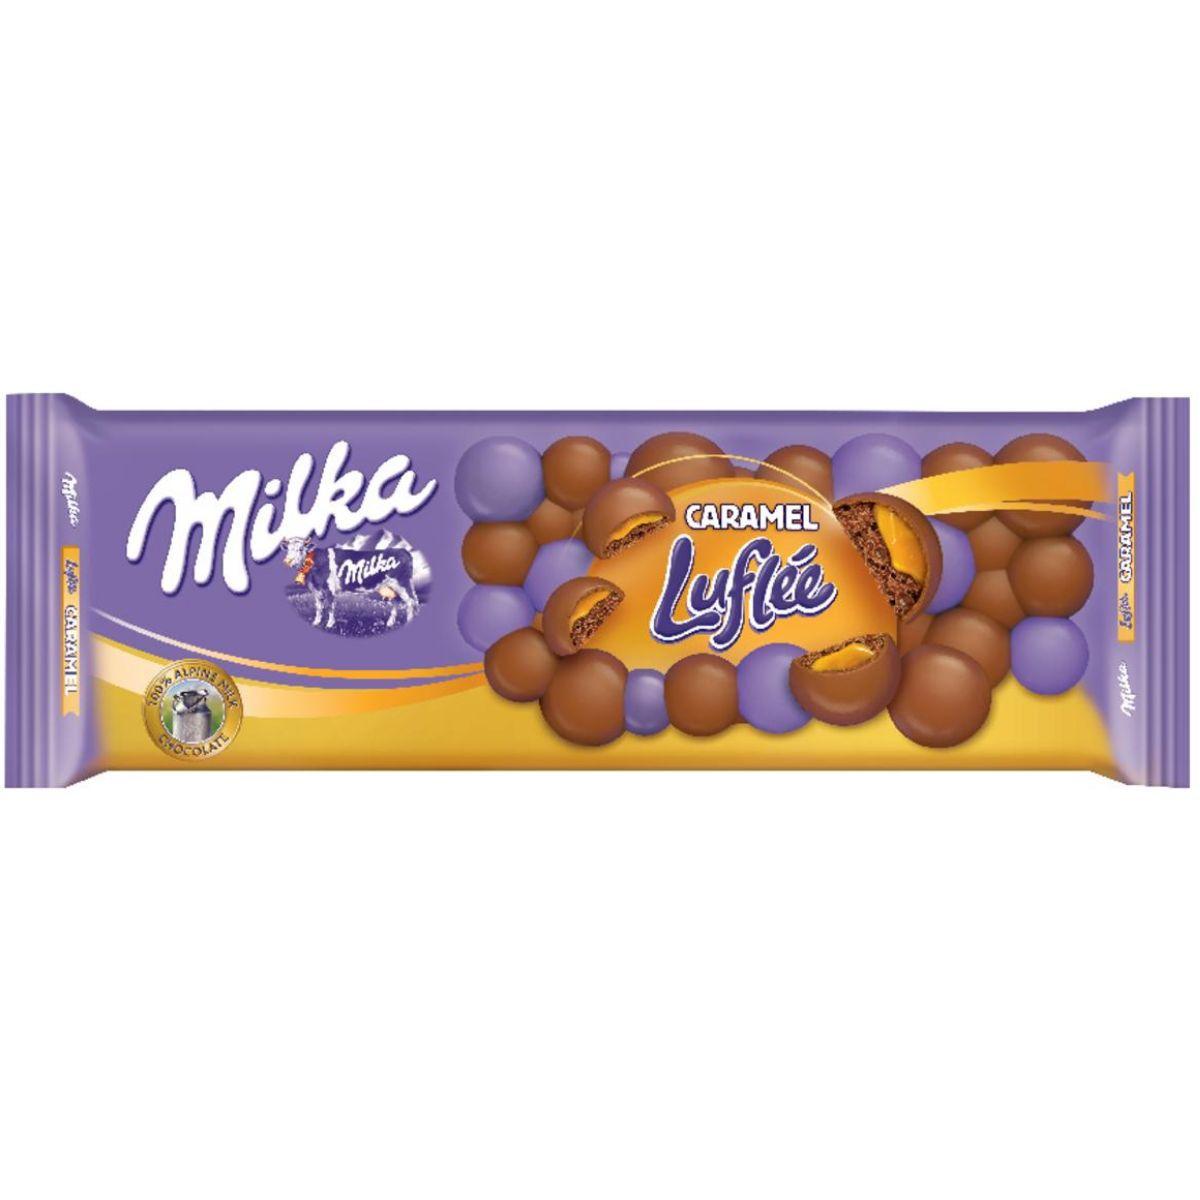 Chocolate Barra Milka Luflee Caramel 250g